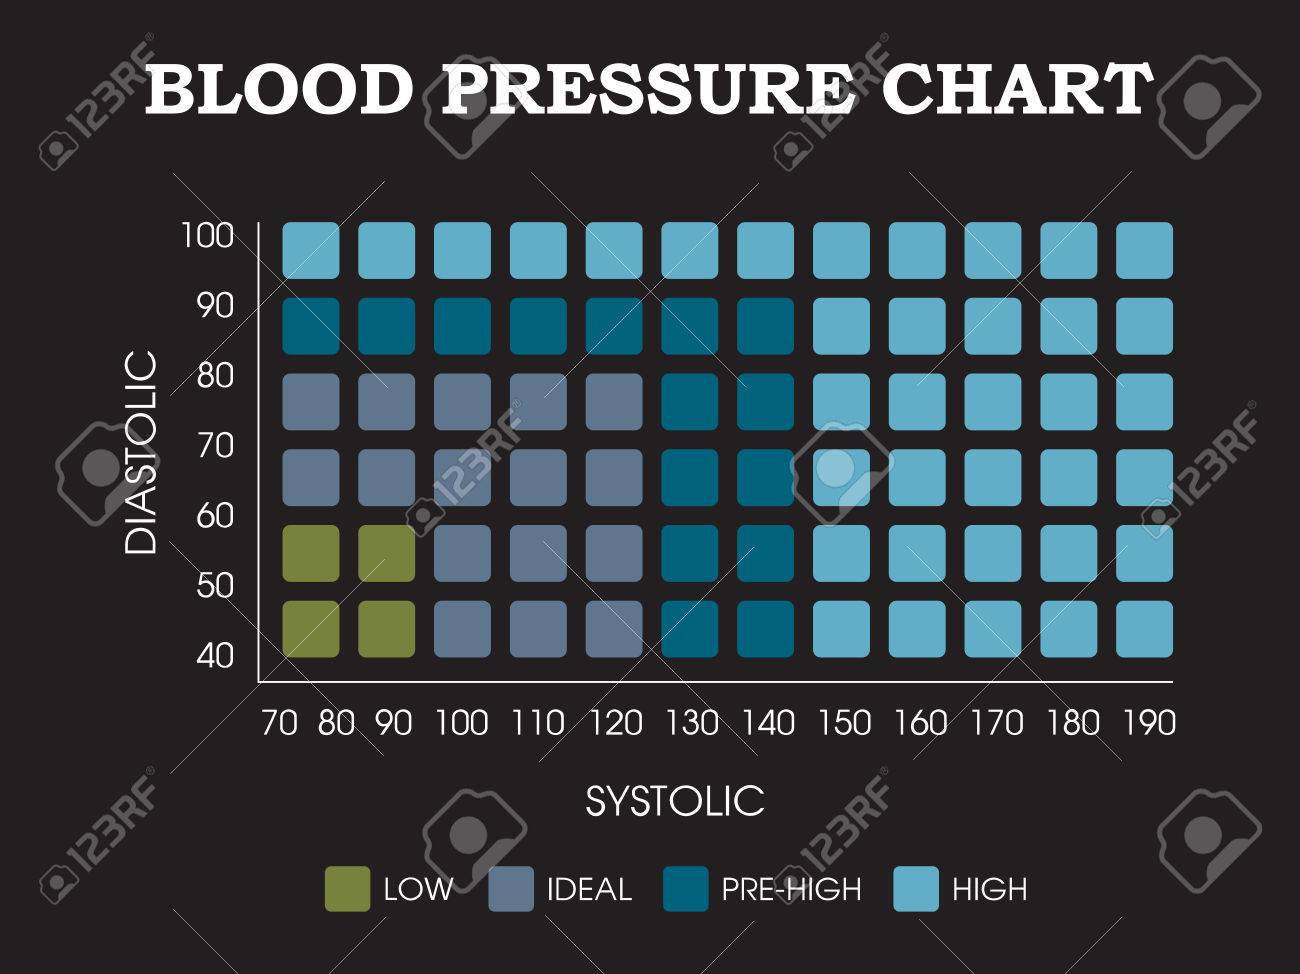 Blood pressure chart diastolic systolic measurement infographic blood pressure chart diastolic systolic measurement infographic stock vector 57527439 geenschuldenfo Choice Image